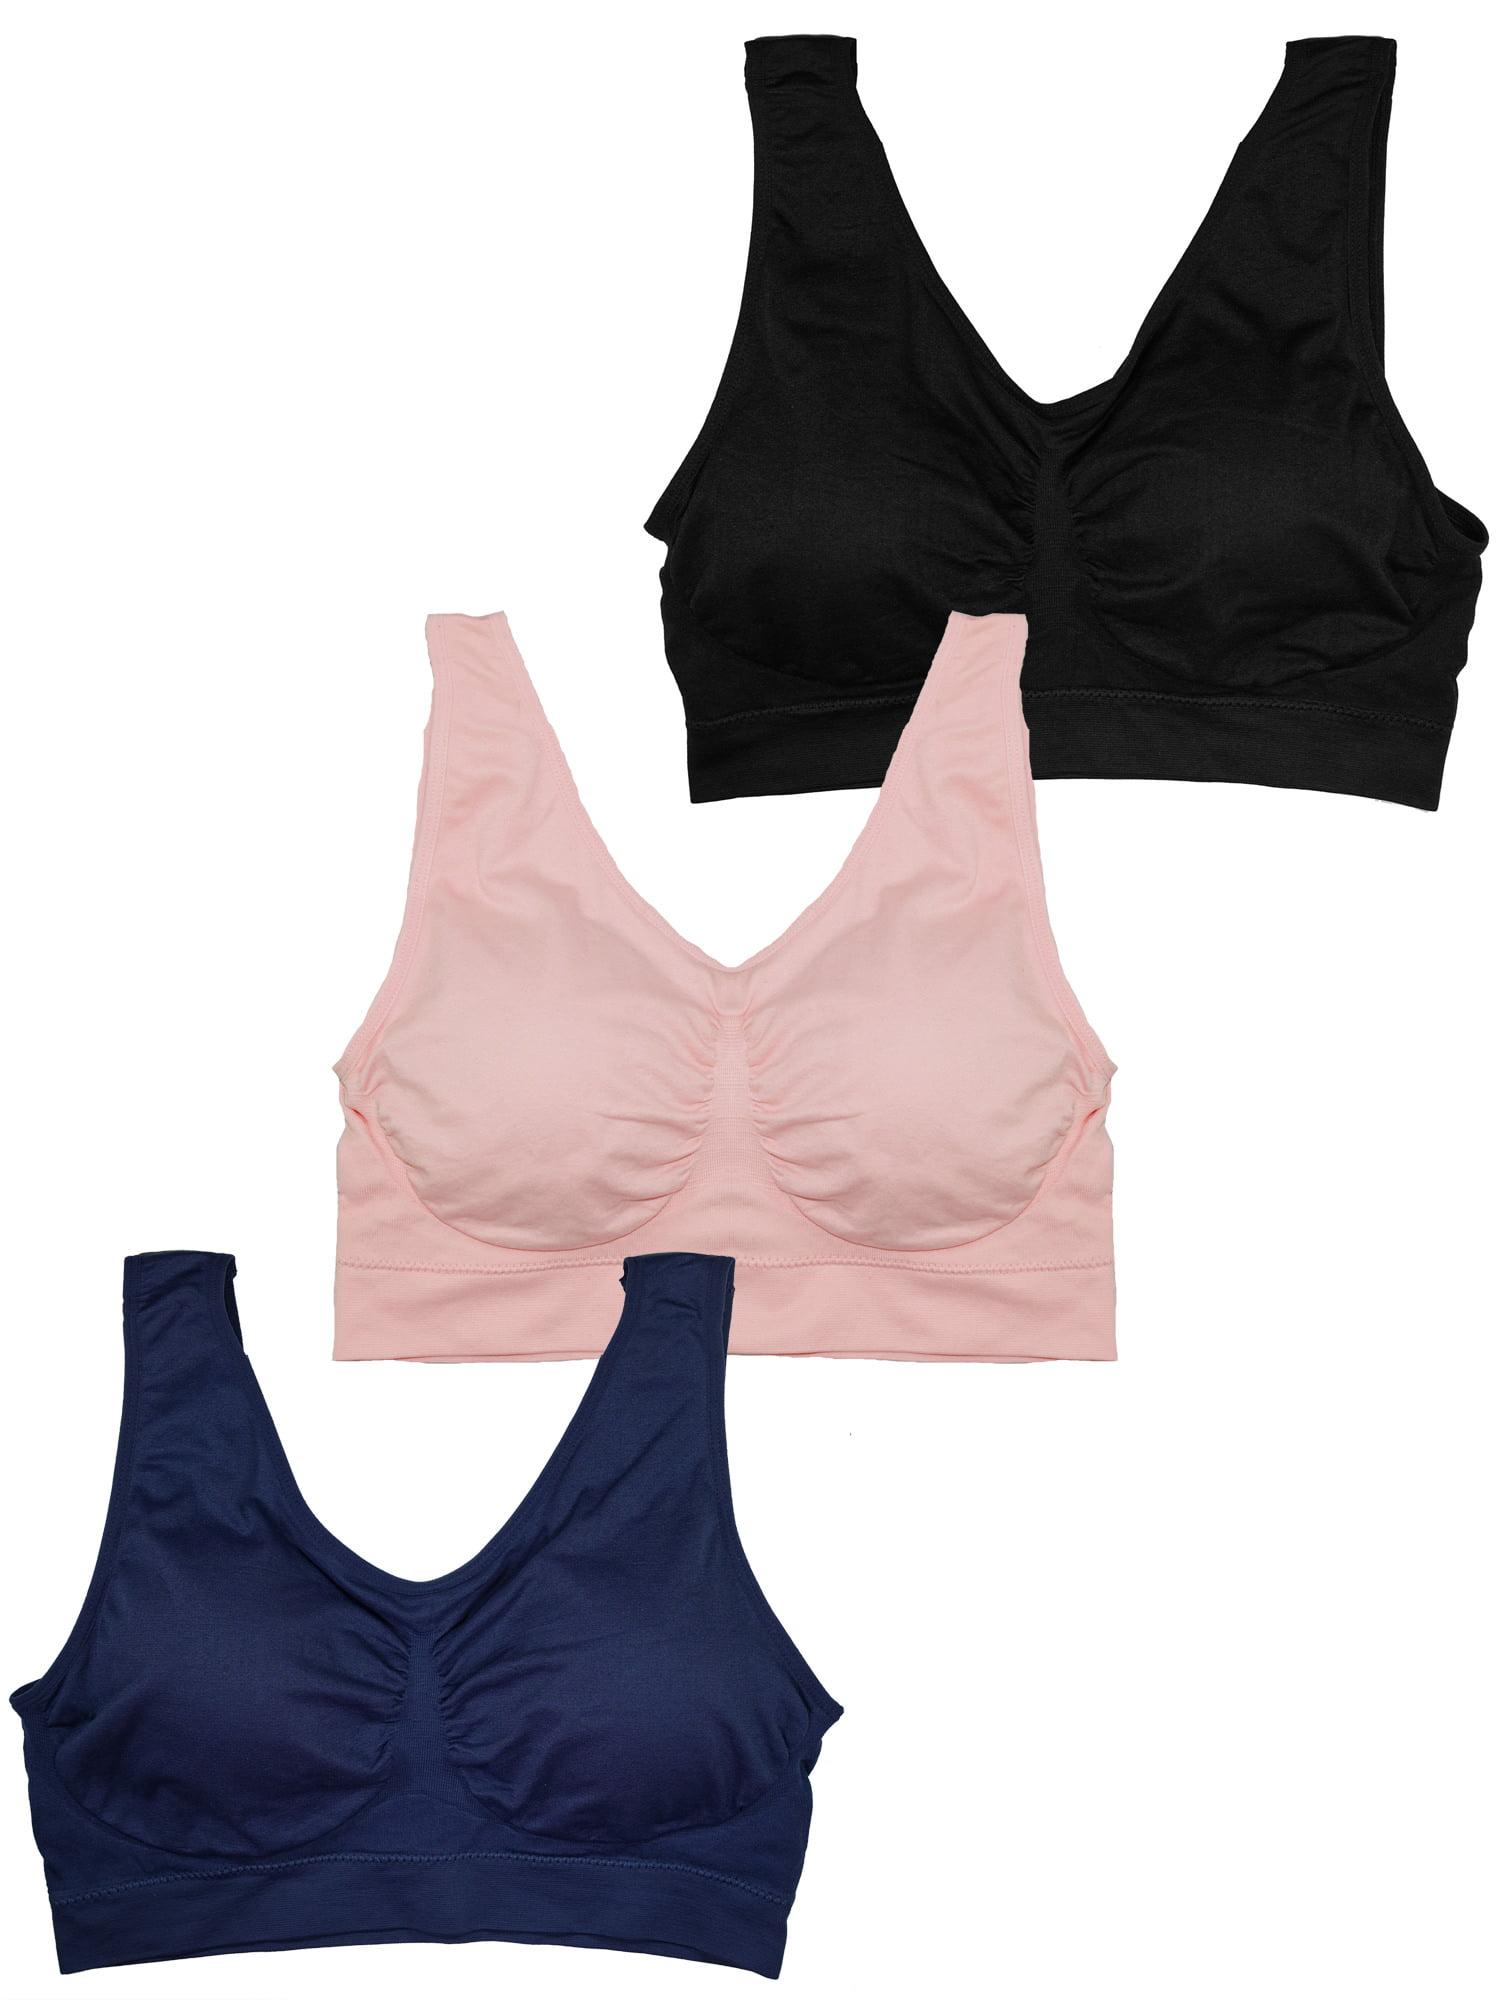 Fiere Womens Lingerie Wirefree Bralette 5 Pack Plus-Size Seamless Vest Bra